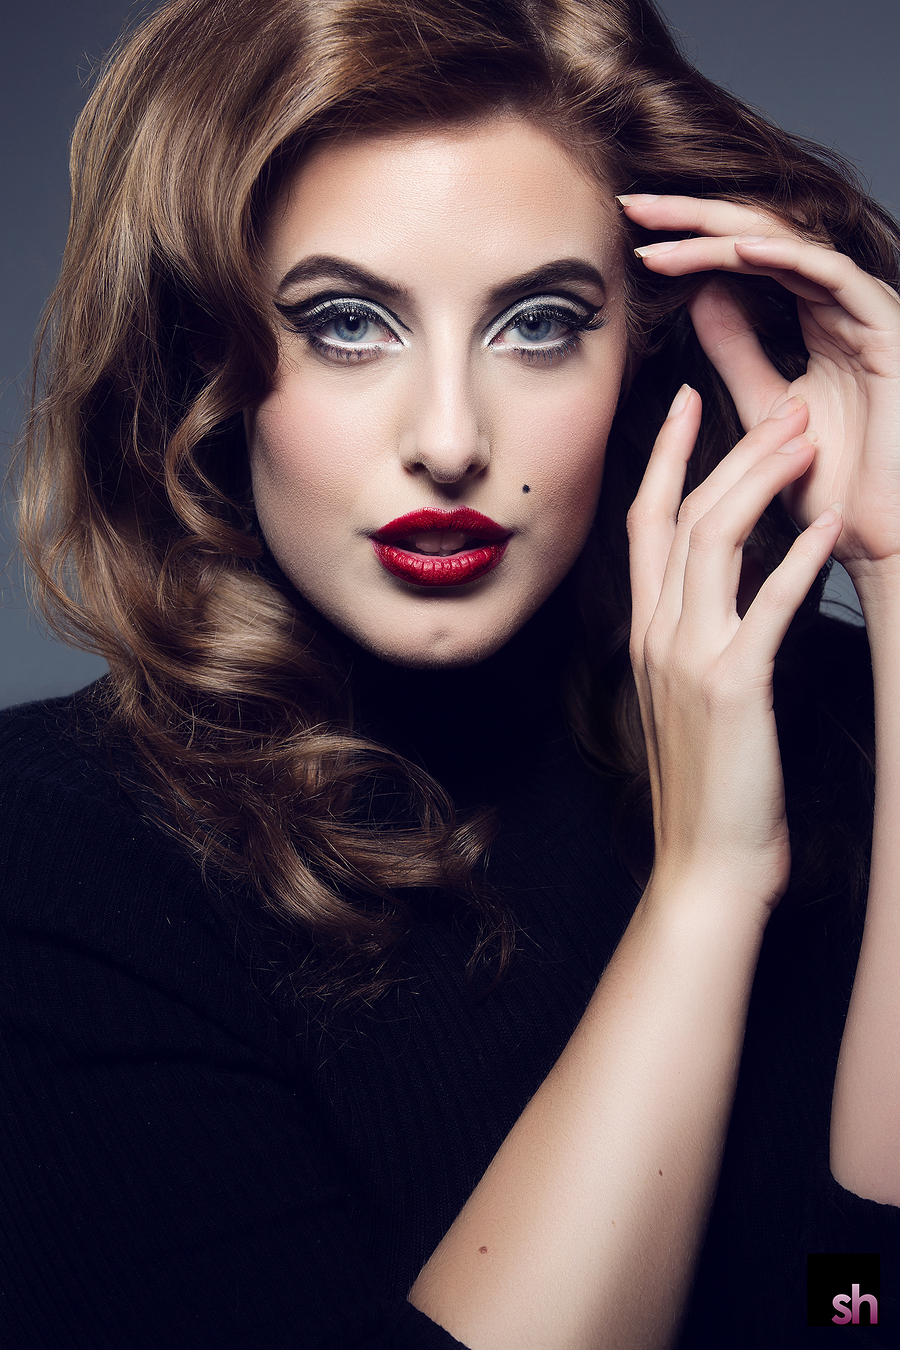 Beauty Spot / Photography by Saracen House Studio, Model Arabella, Makeup by Natalie Wood, Taken at Saracen House Studio / Uploaded 13th January 2018 @ 01:53 PM